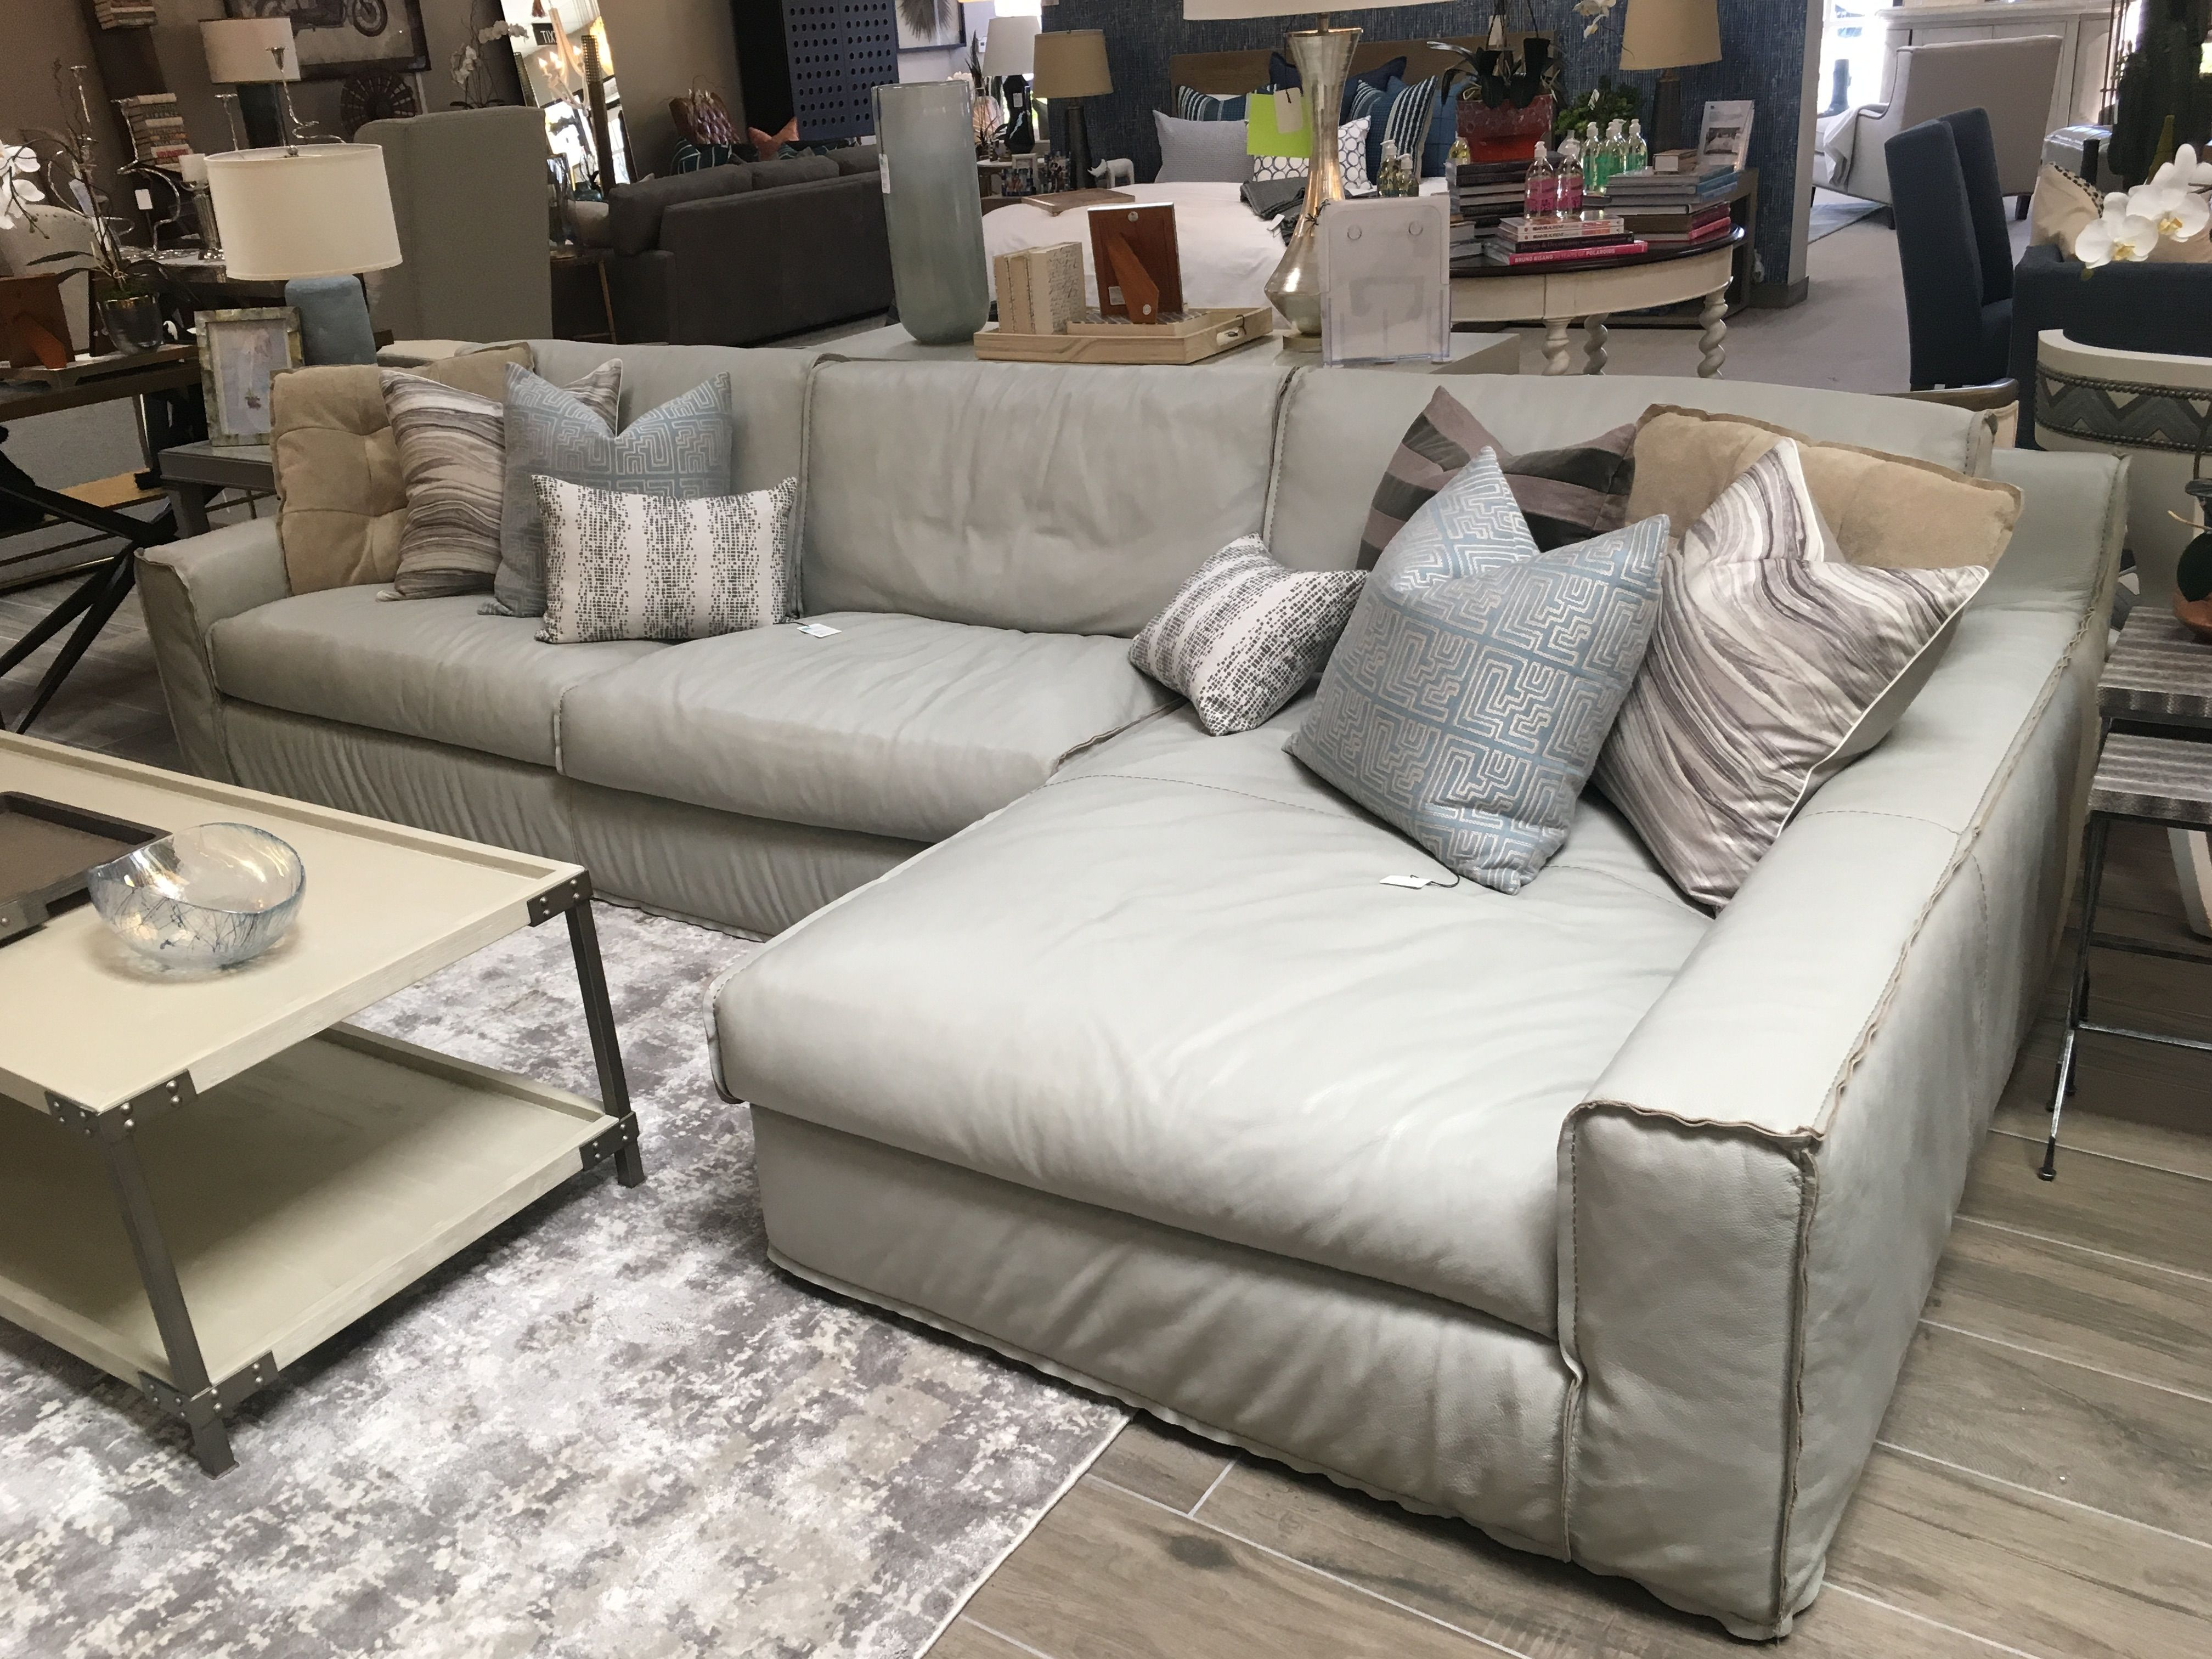 Eleanor Rigby Melrose Sofa   Made In California